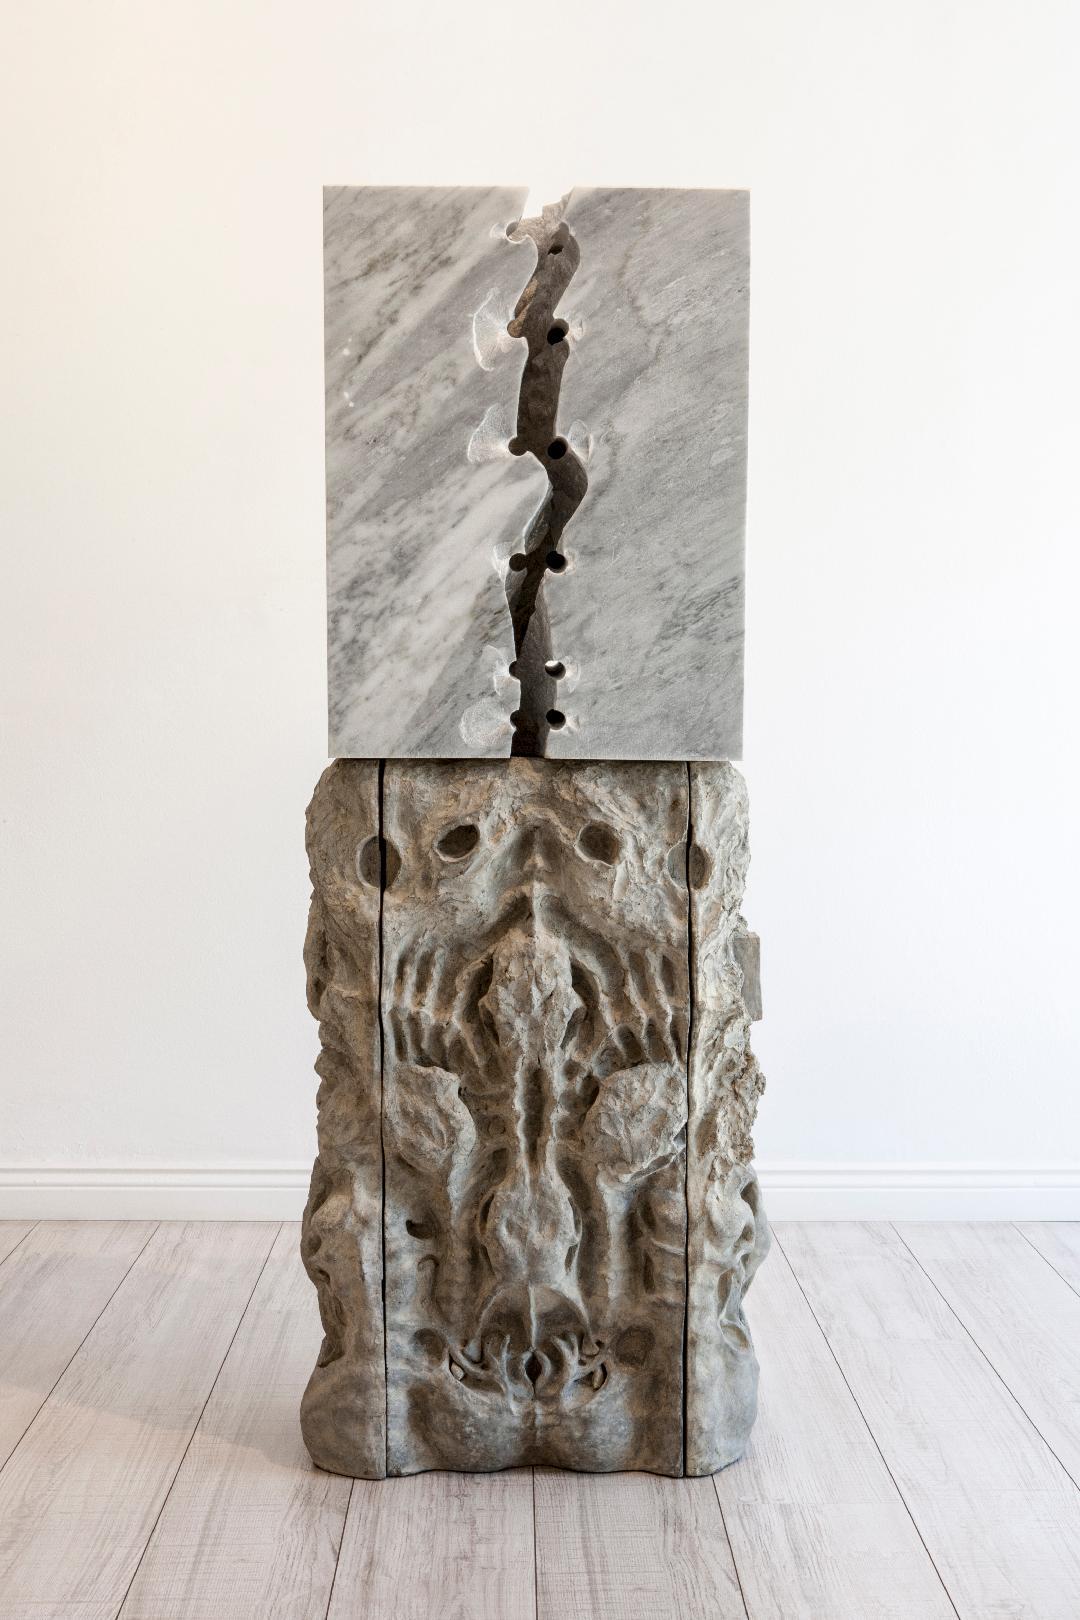 Missence - Carrara Marble and Iron300 x 600 x 1400 mm78 700 ZAR